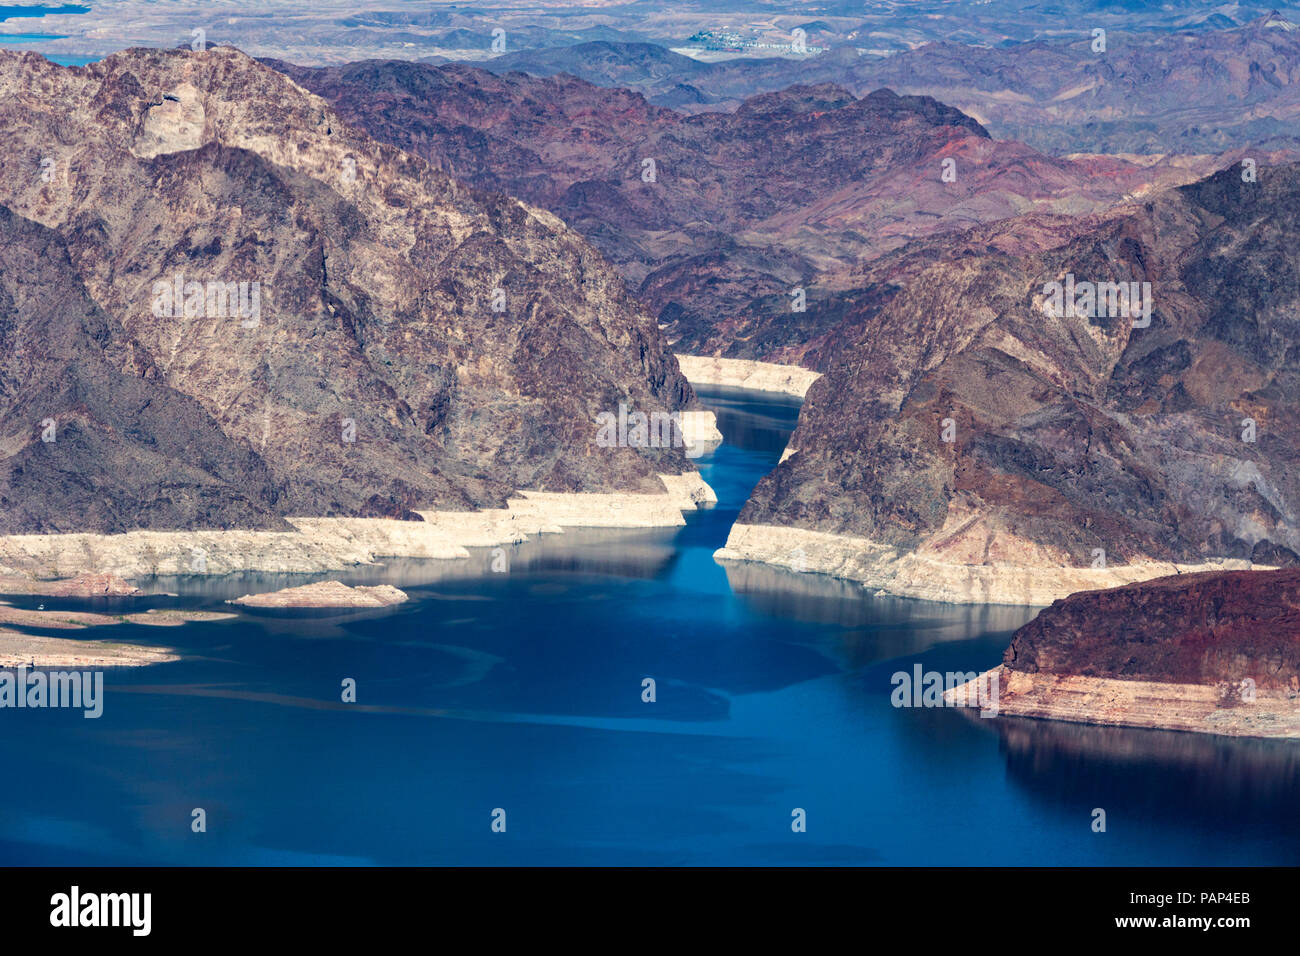 Lake Mead Desert Scene, Grand Canyon National Park, Arizona, Nevada Border, United States of America, Tuesday, May 29, 2018. Stock Photo